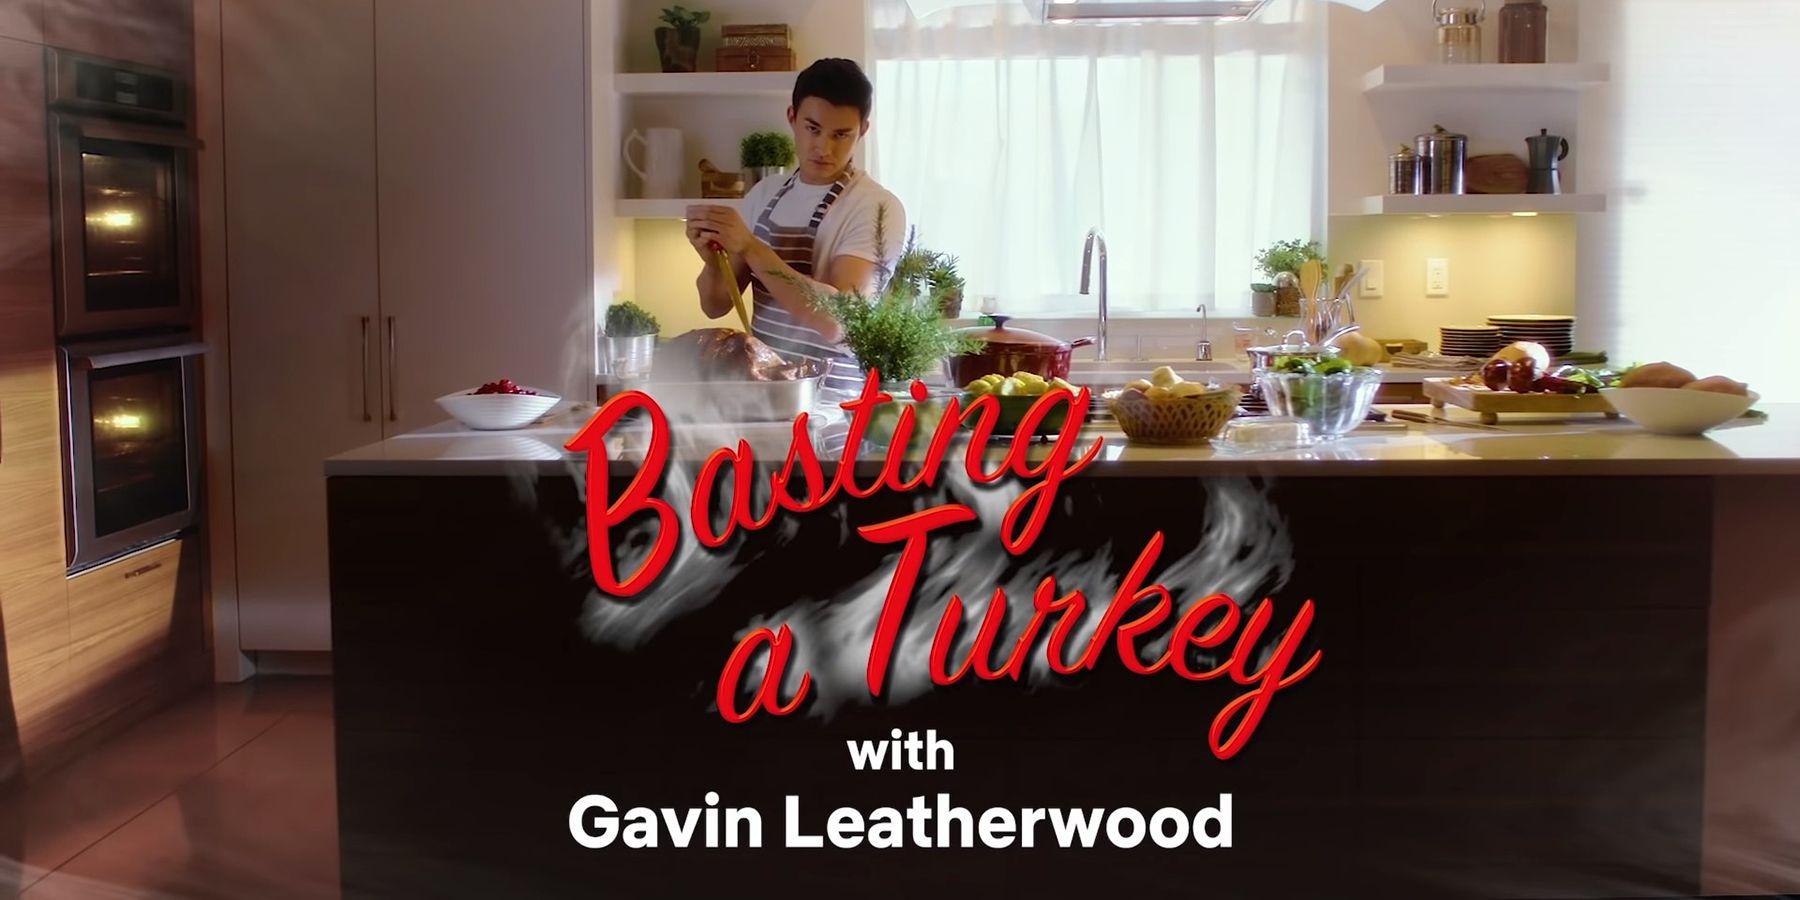 Sabrina S Nick Scratch Seductively Bastes A Turkey Cbr